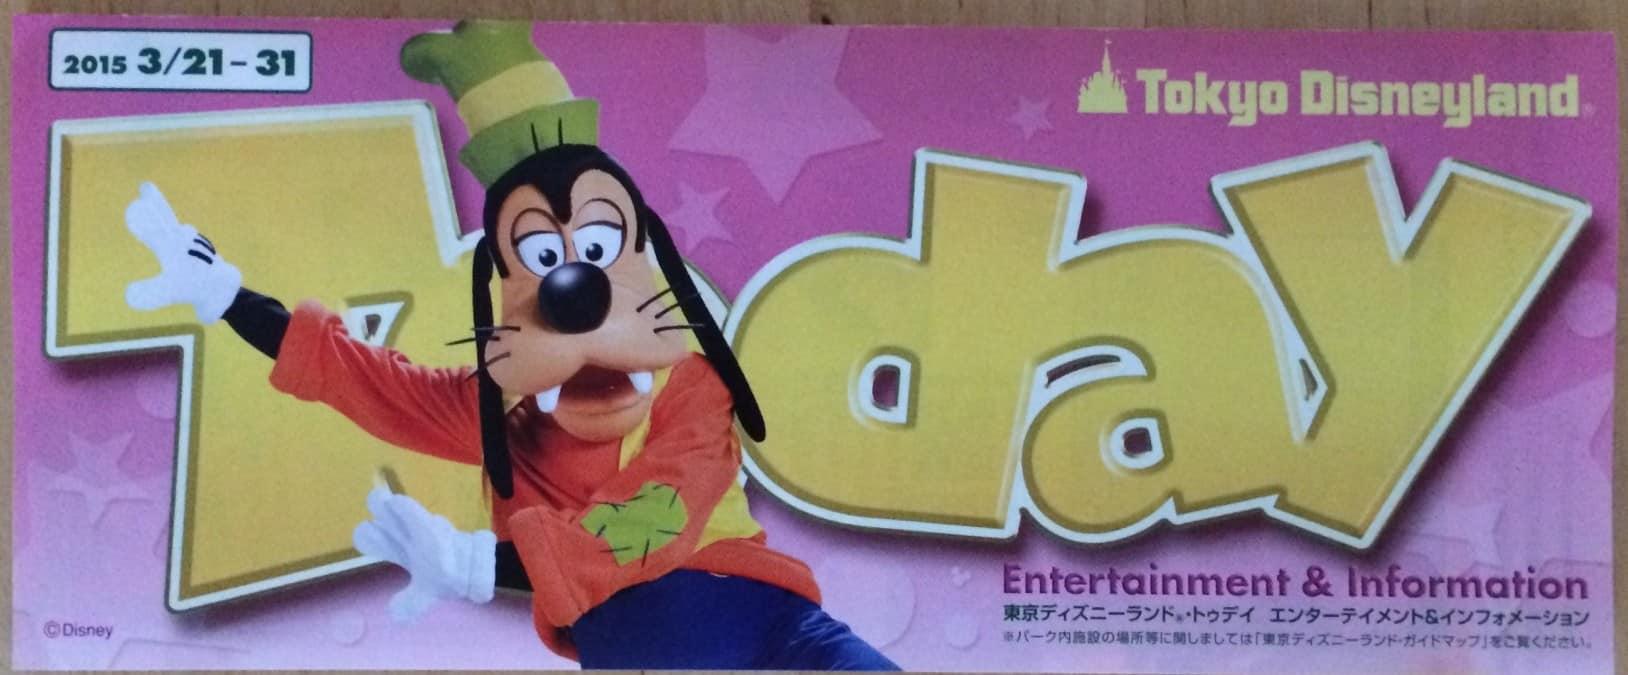 Tokyo Disneyland March 2015 Park Map Featuring Goofy | TDR